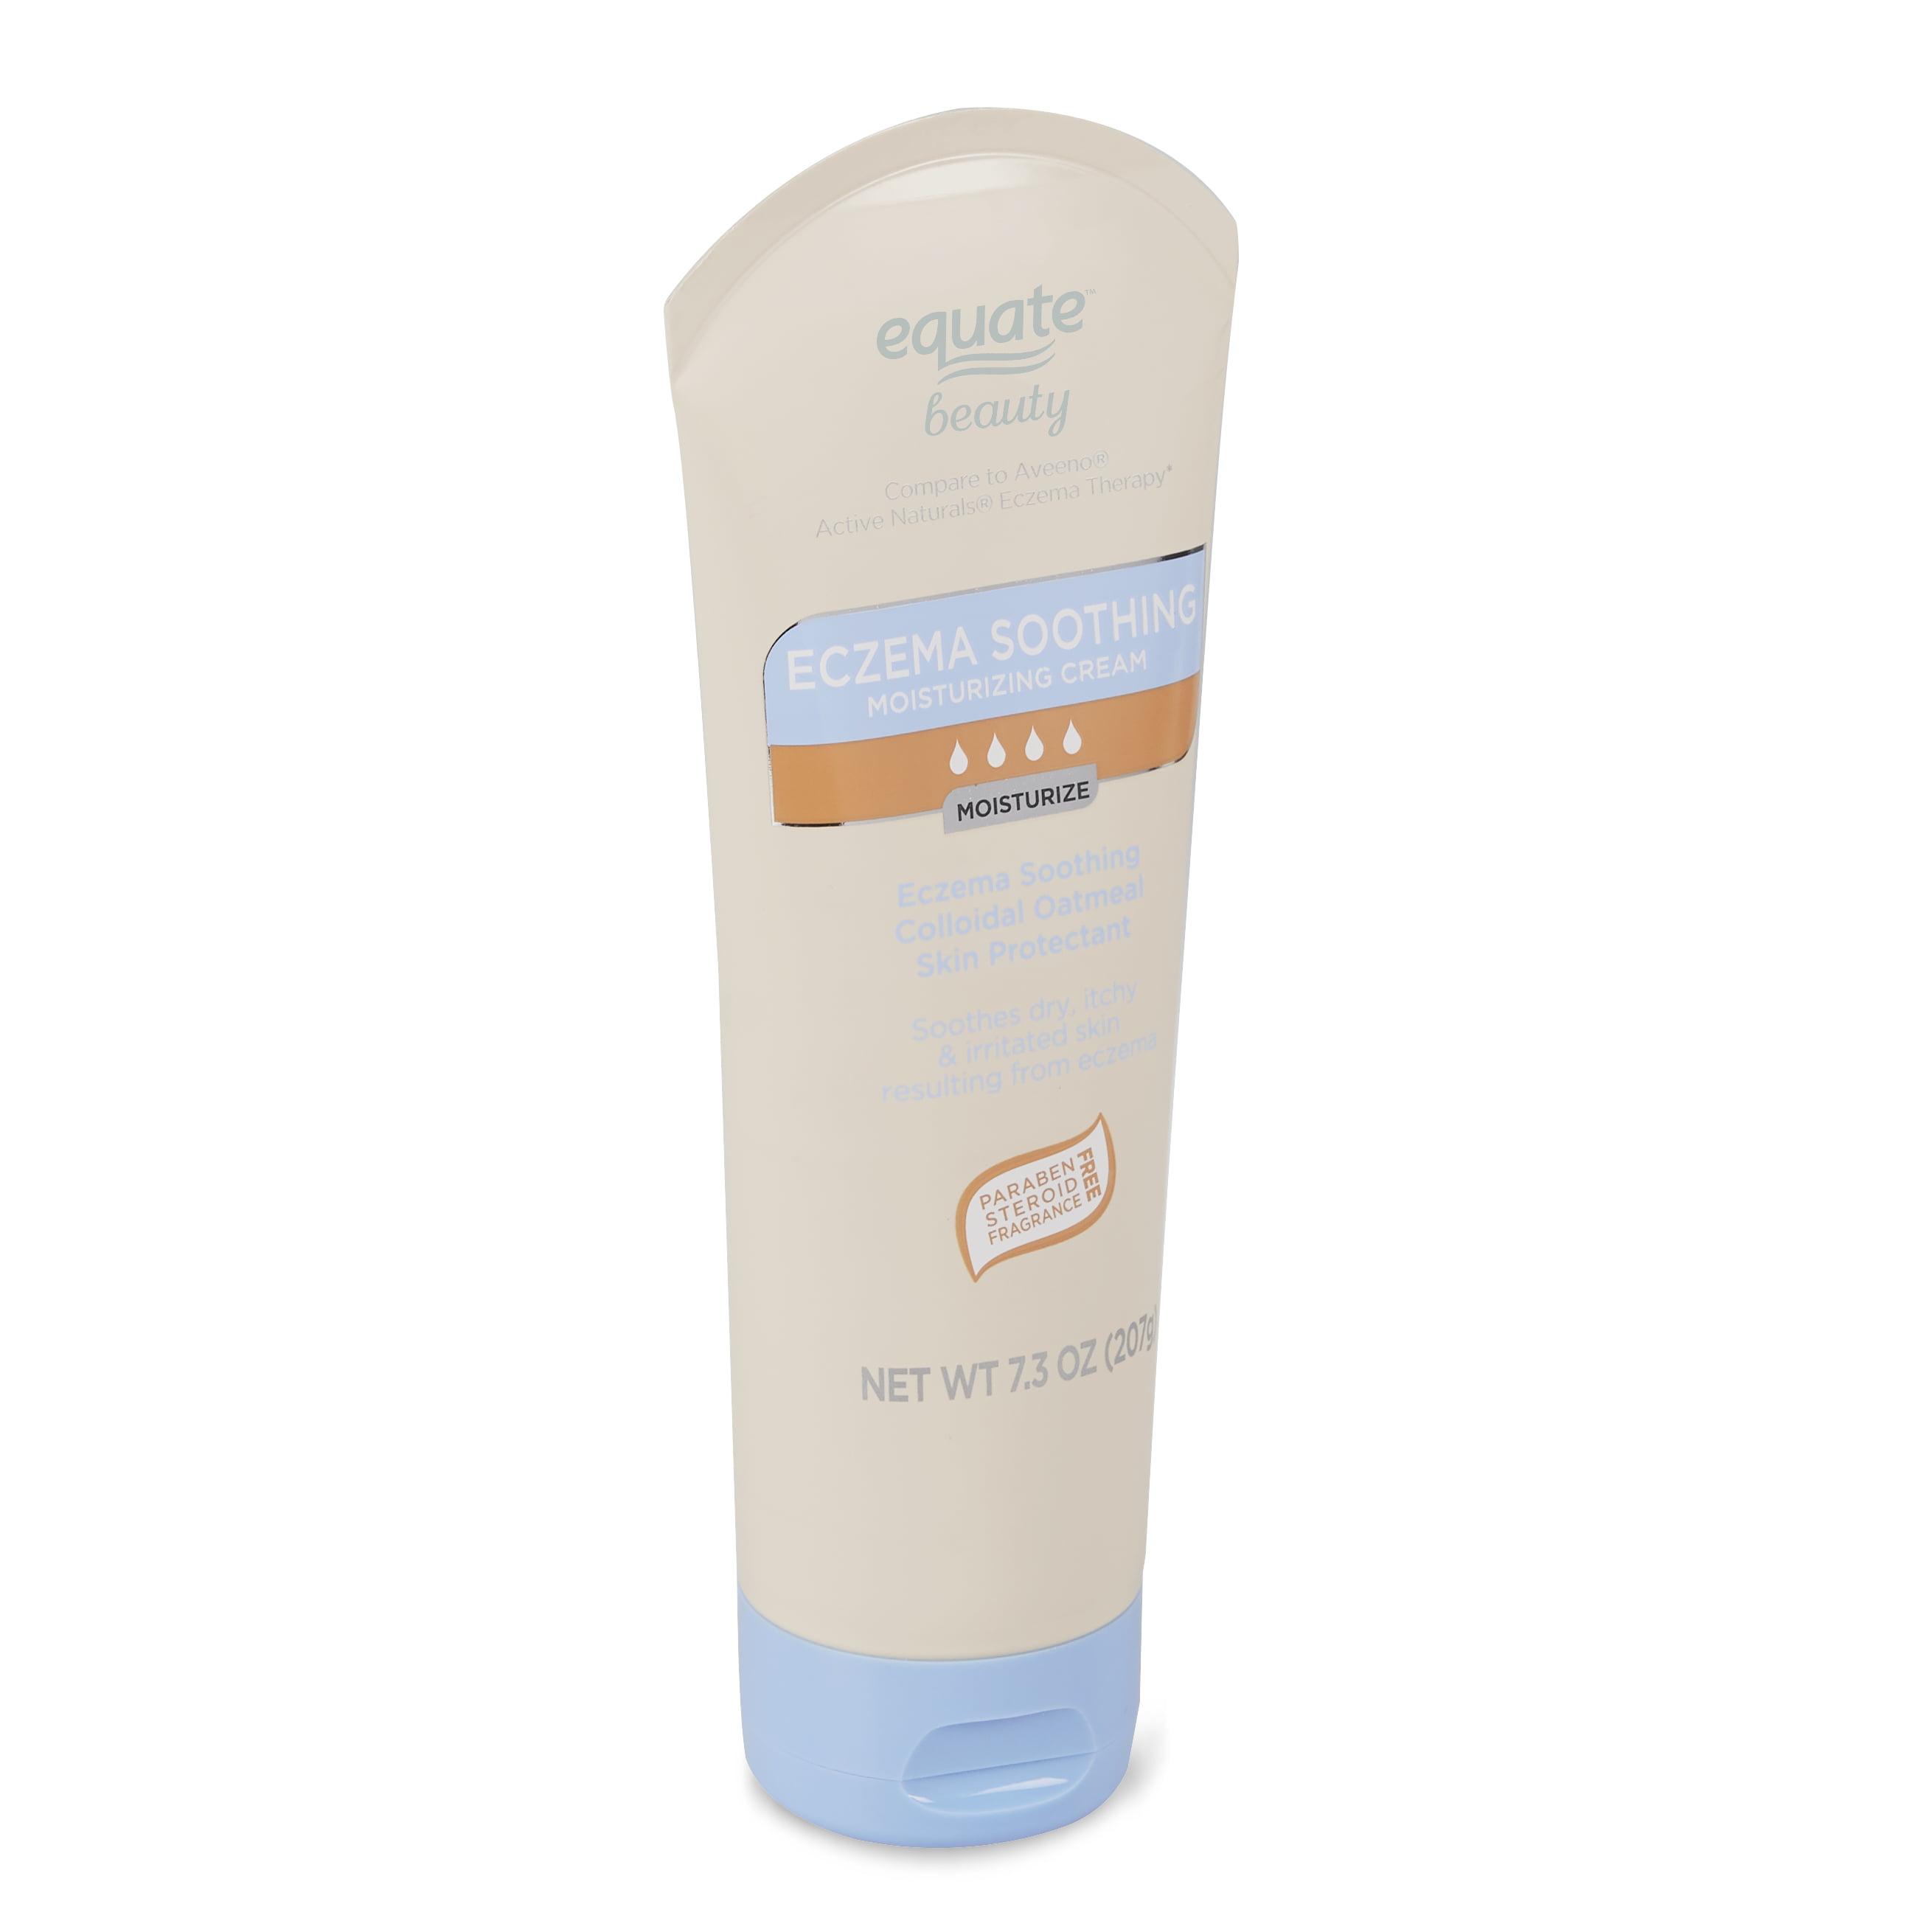 Equate Beauty Eczema Soothing Moisturizing Cream d7af295c8